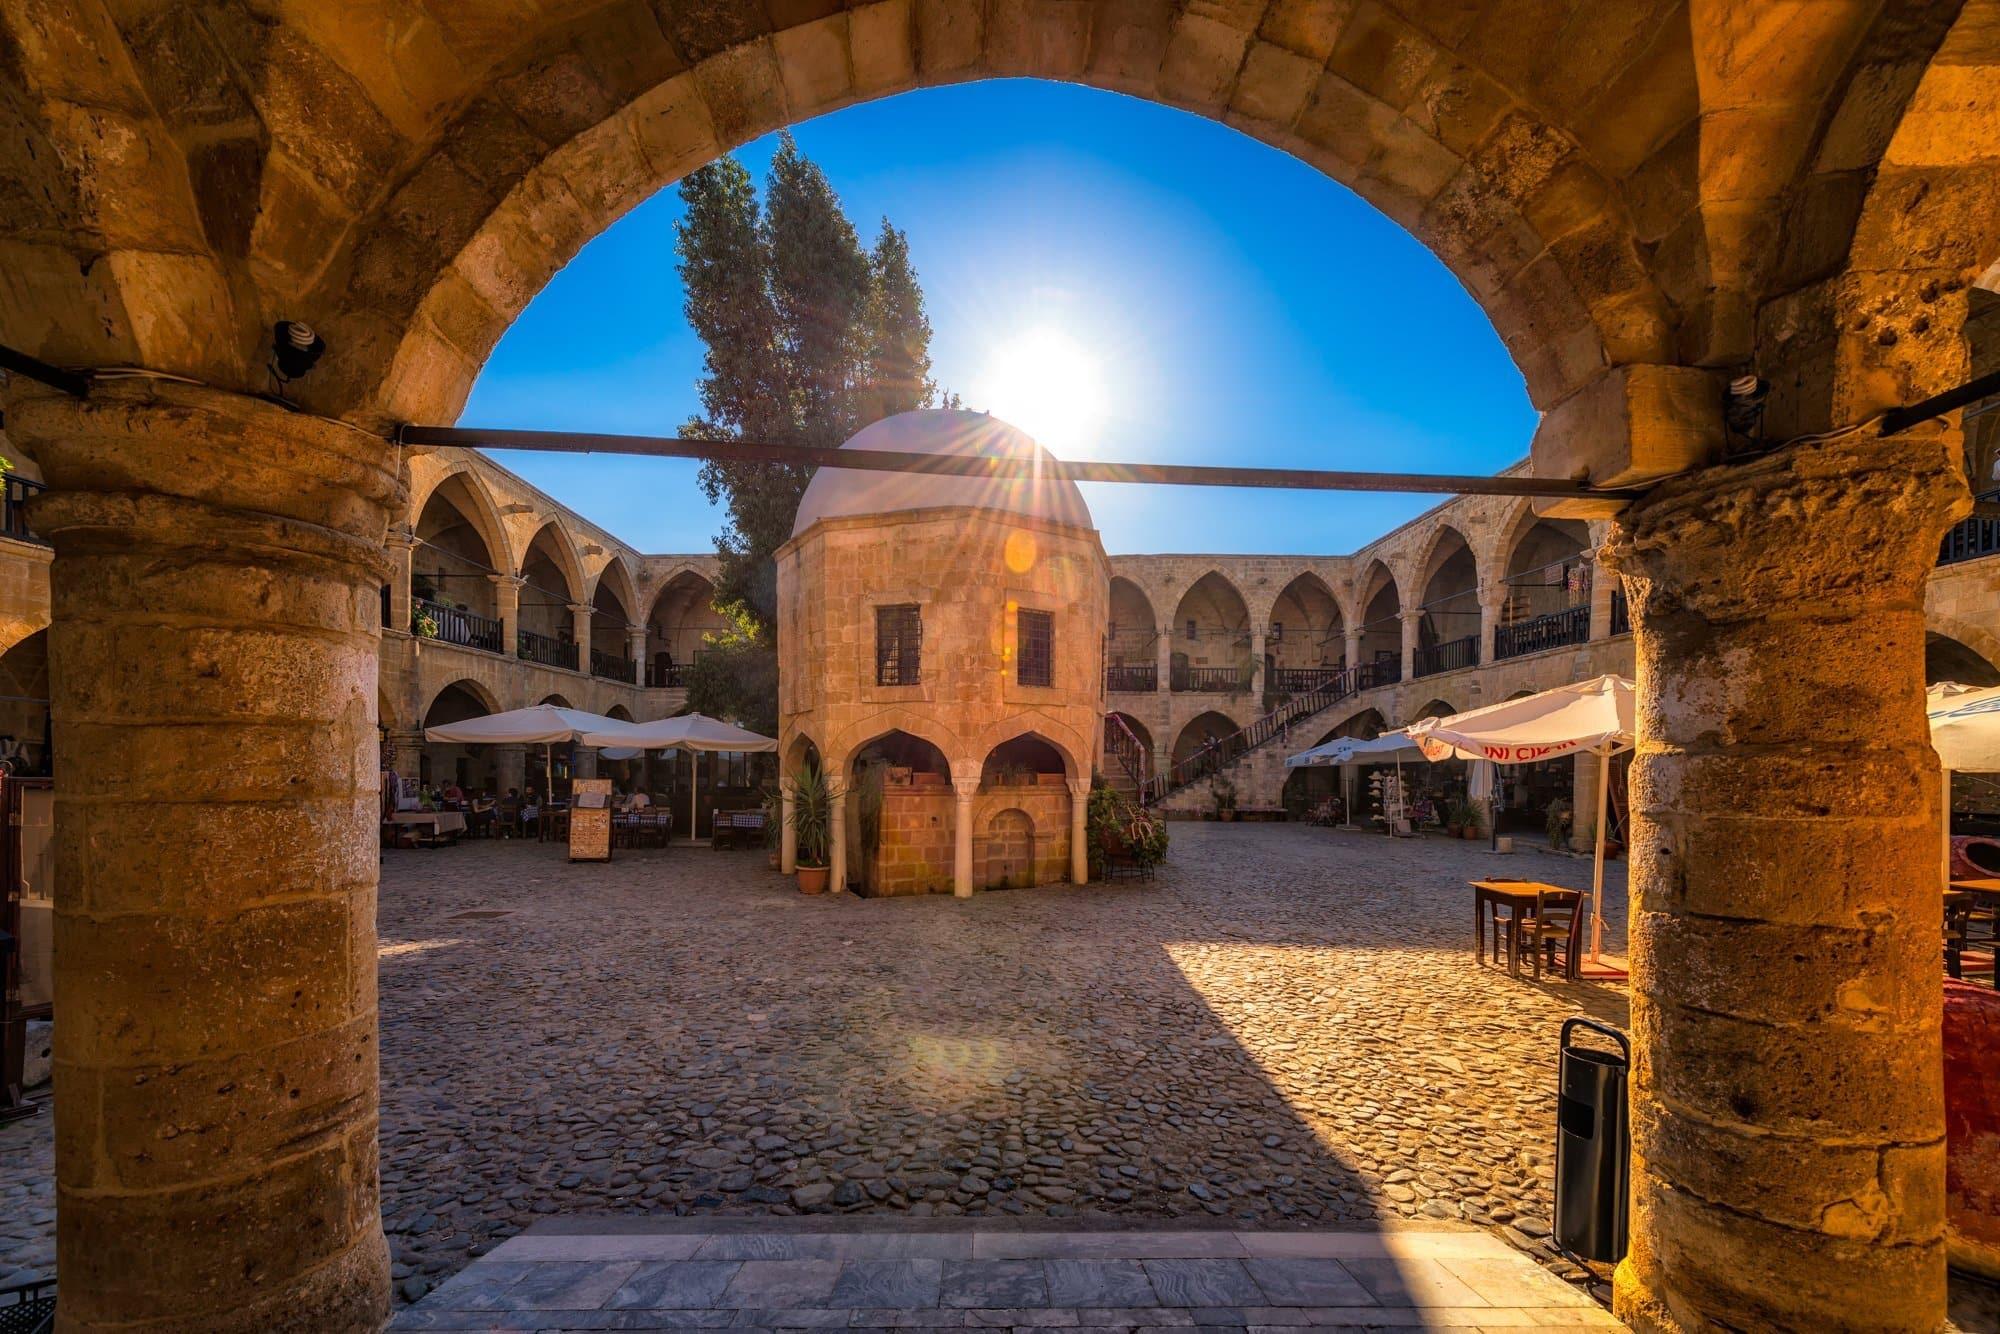 Büyük Han in the North of Nicosia on Cyprus was originally a hotel